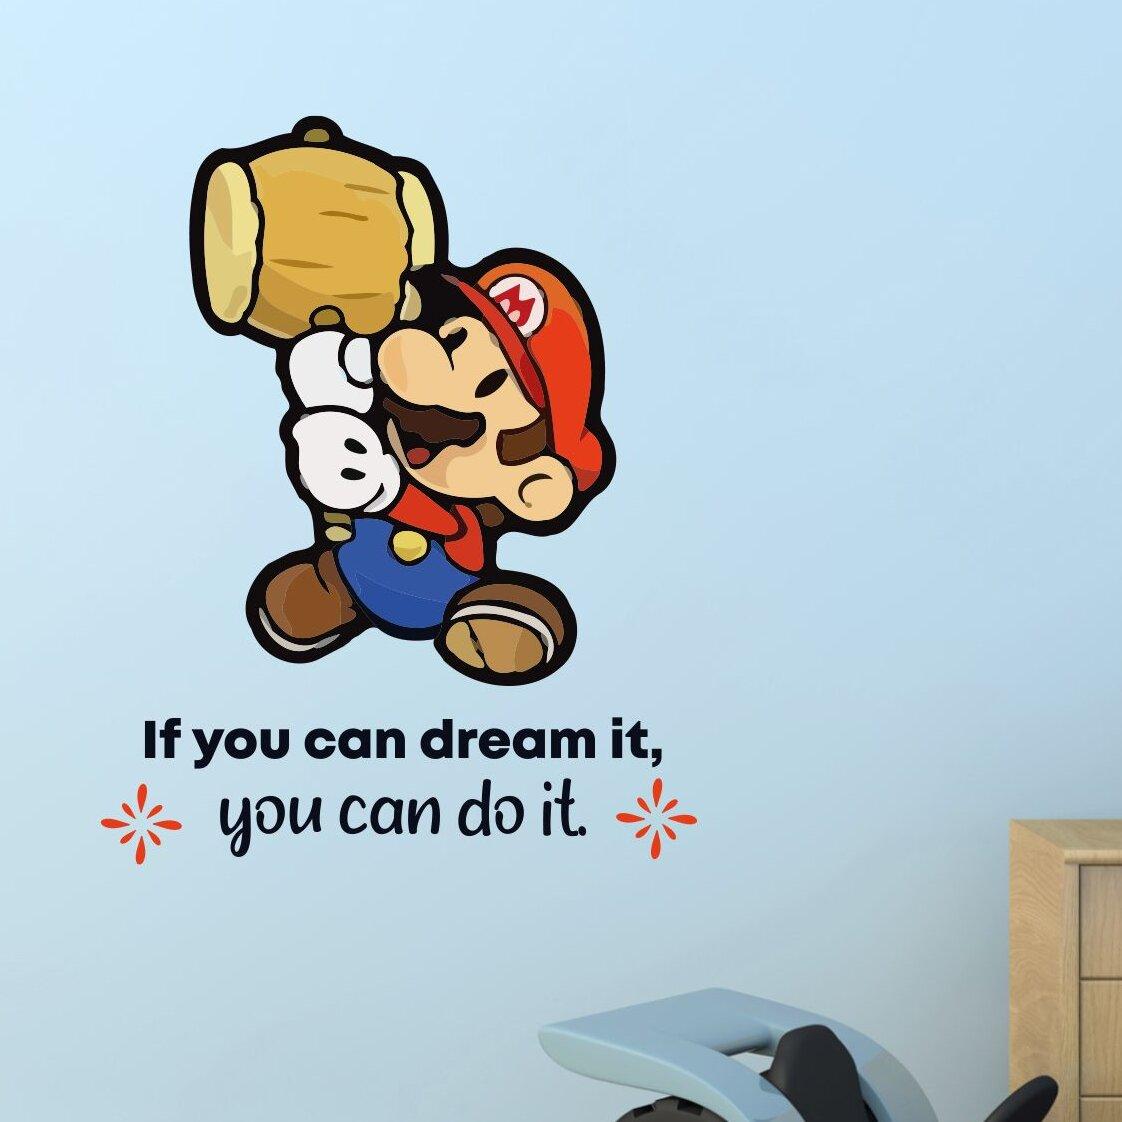 Design With Vinyl Dream It Super Mario Game Life Cartoon Quotes Wall Decal Wayfair